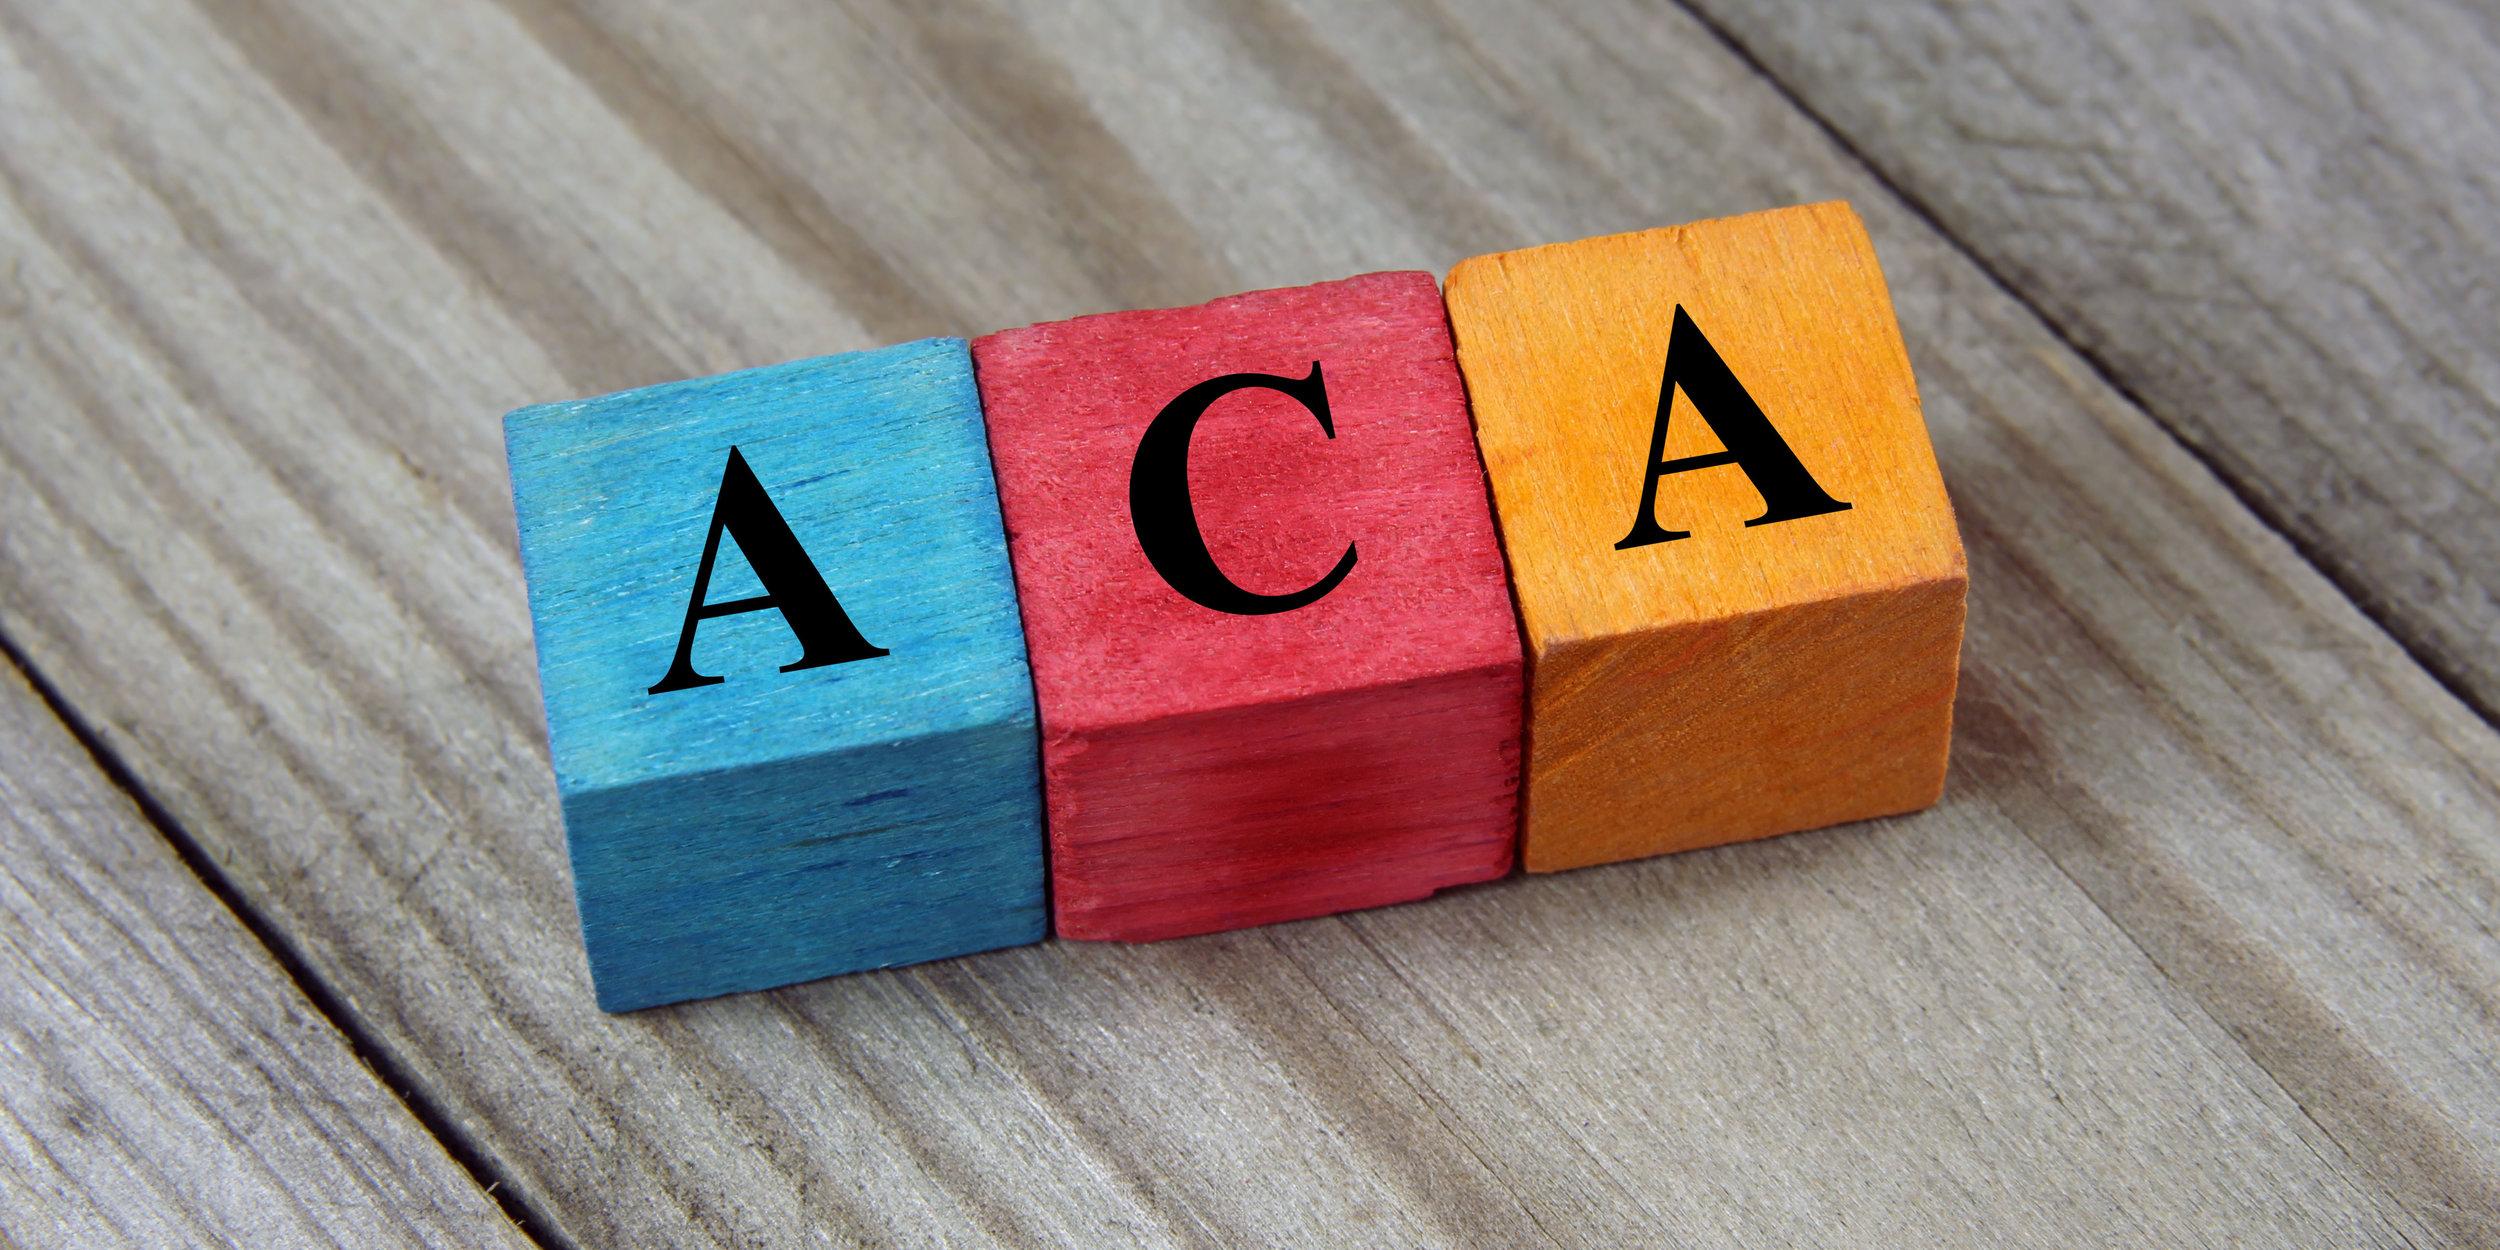 ACA_Blocks_Insurance-Trust_web.jpg